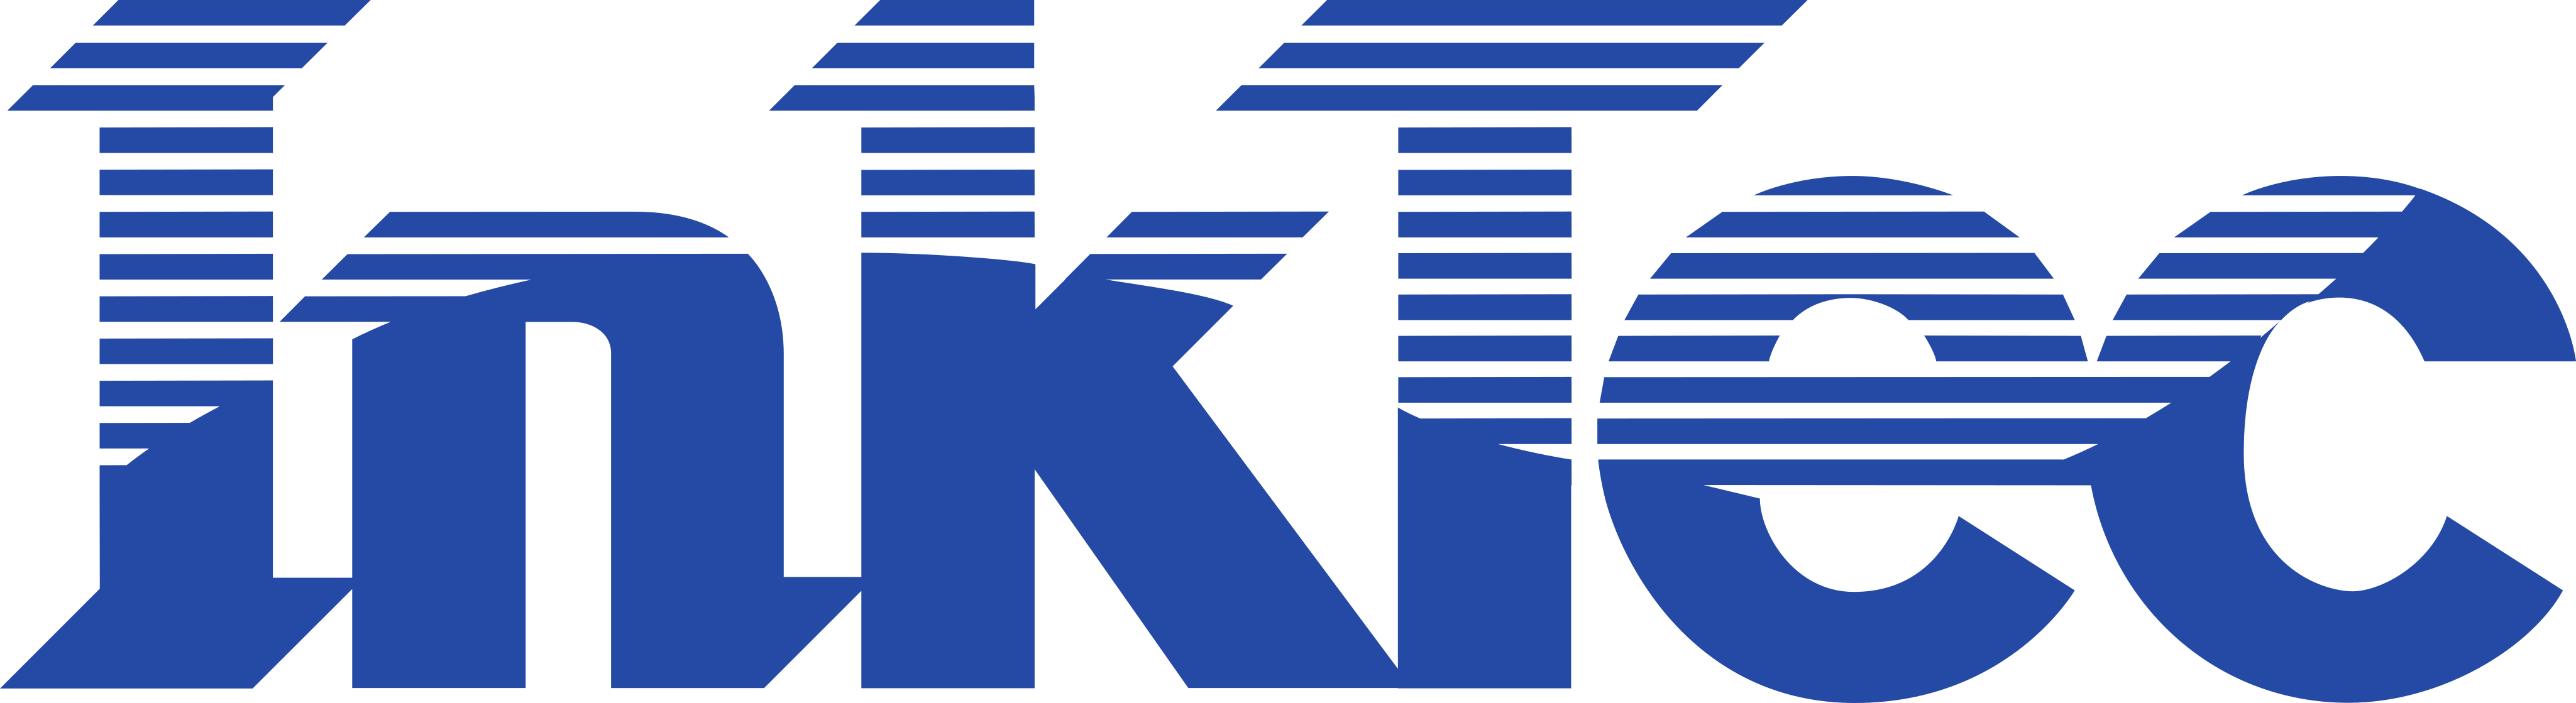 Inktec Logo.